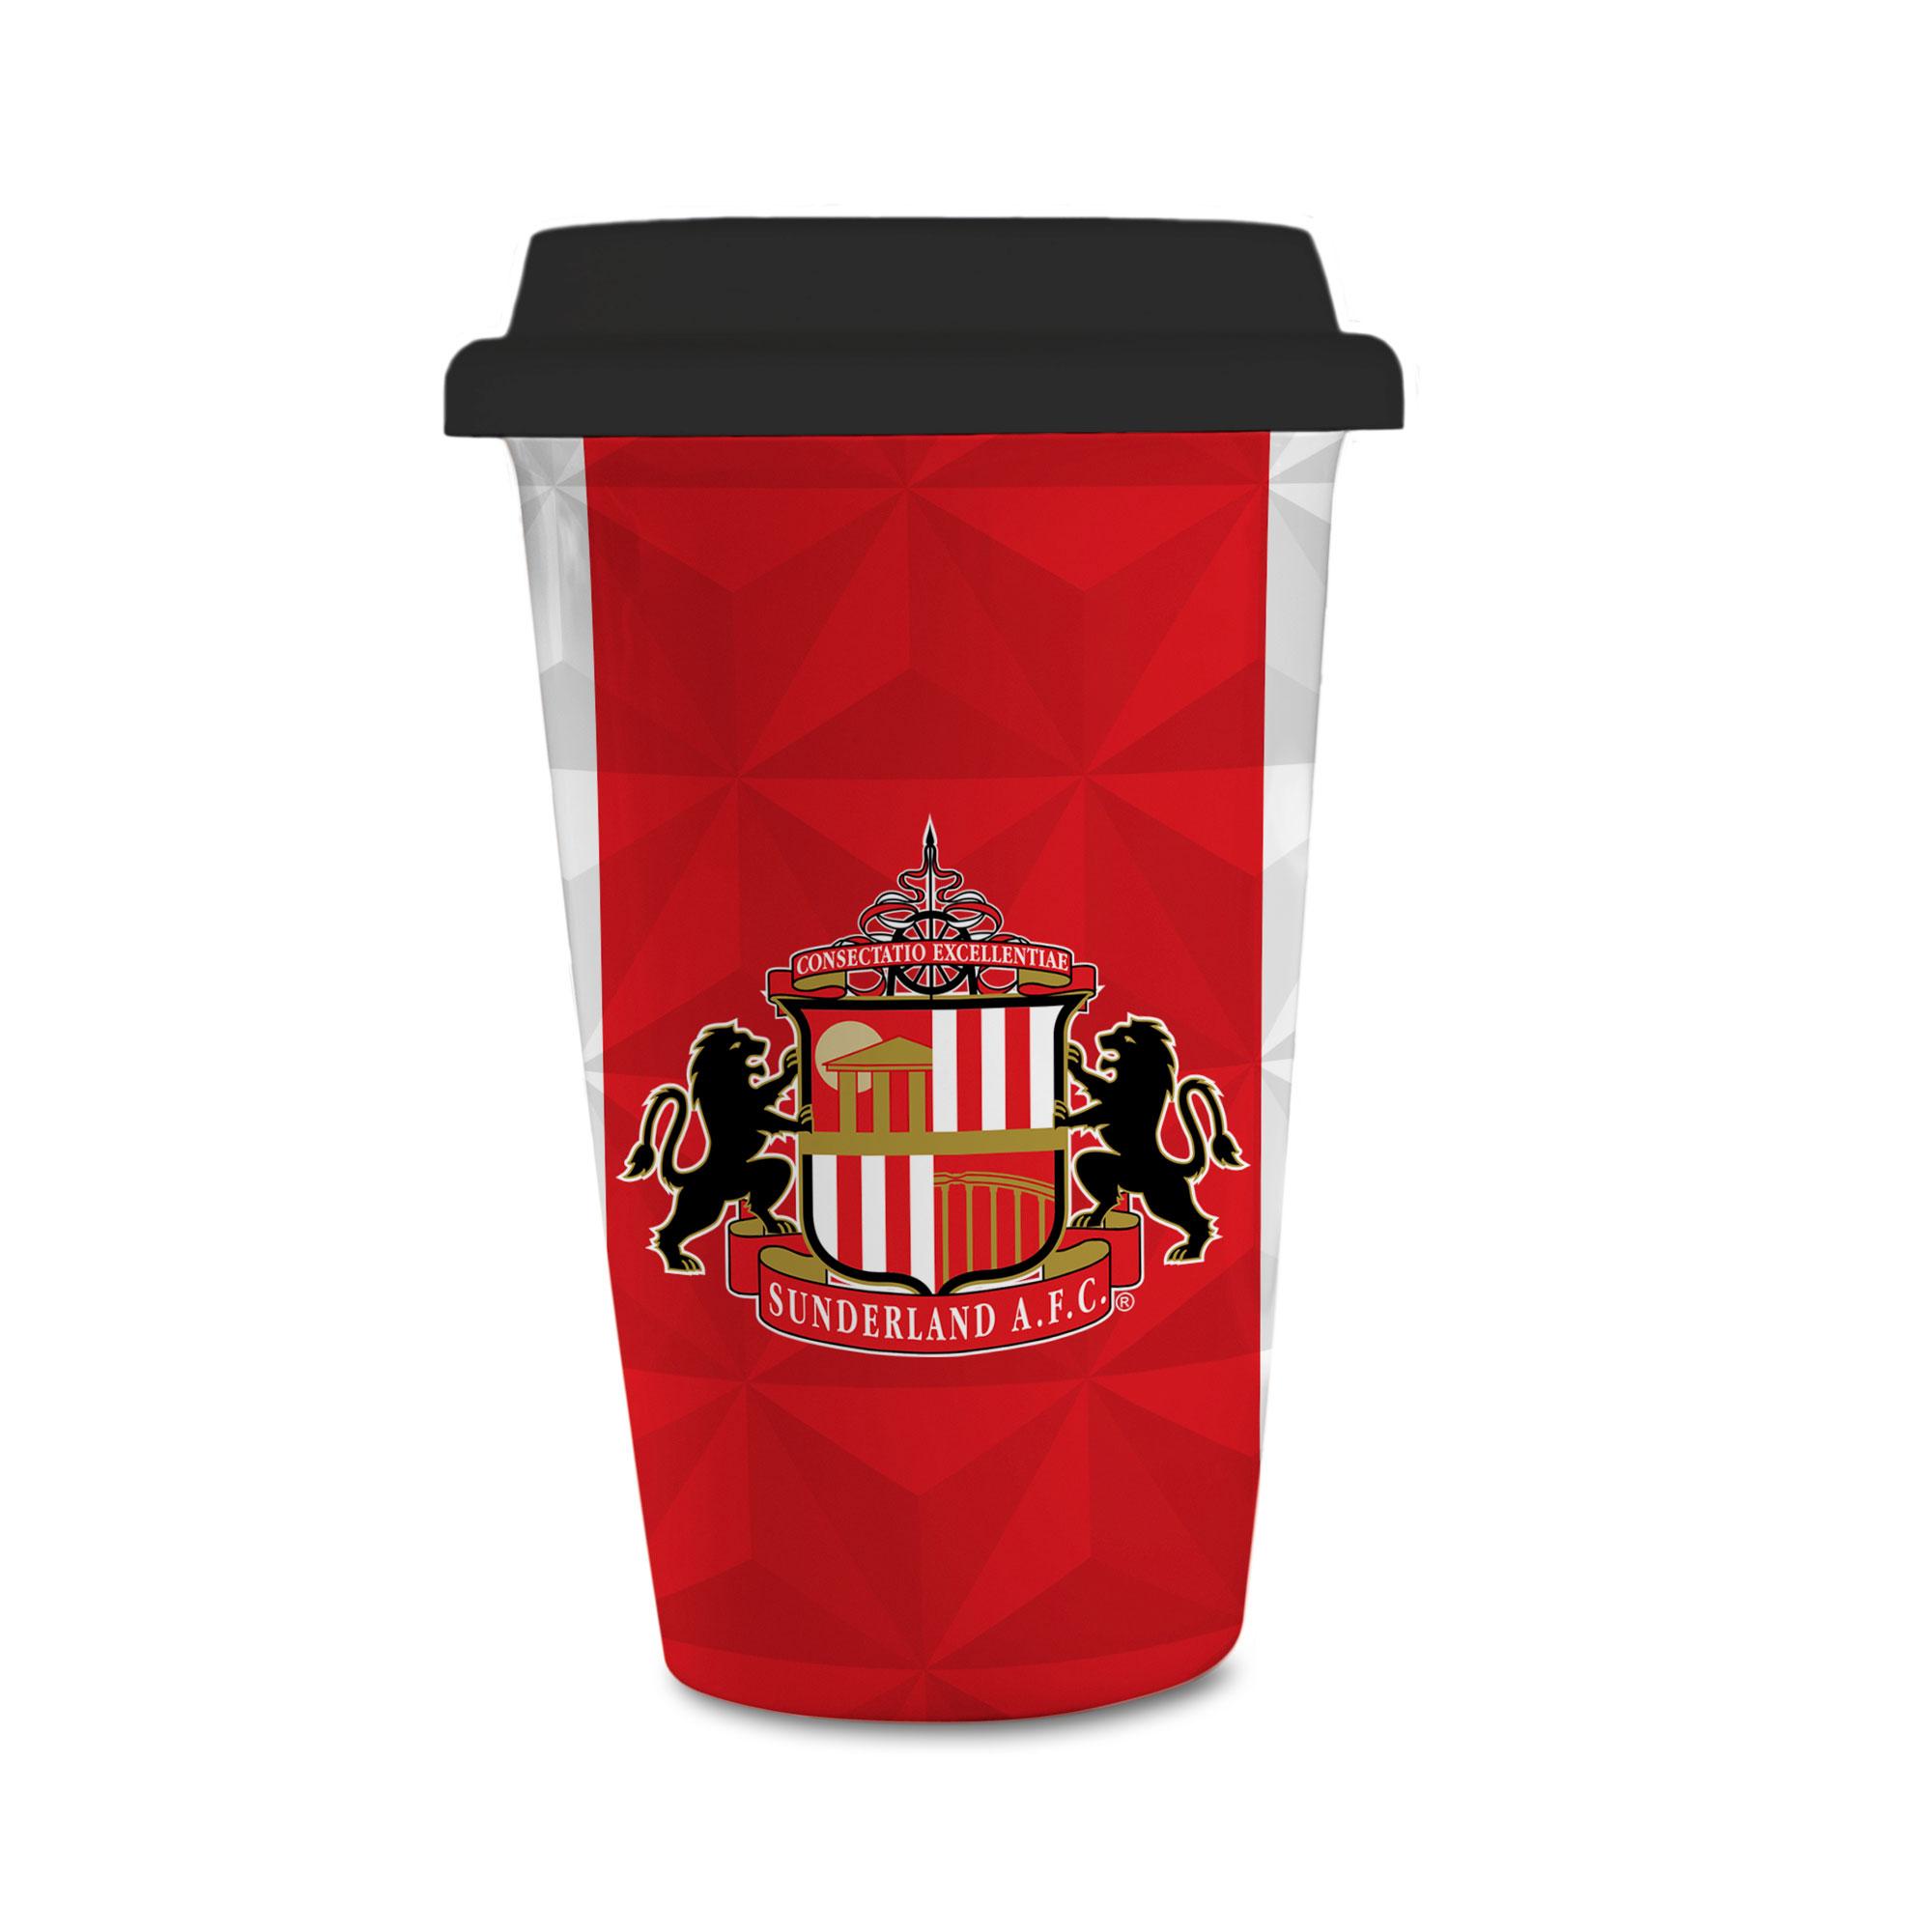 Sunderland AFC Crest Reusable Cup